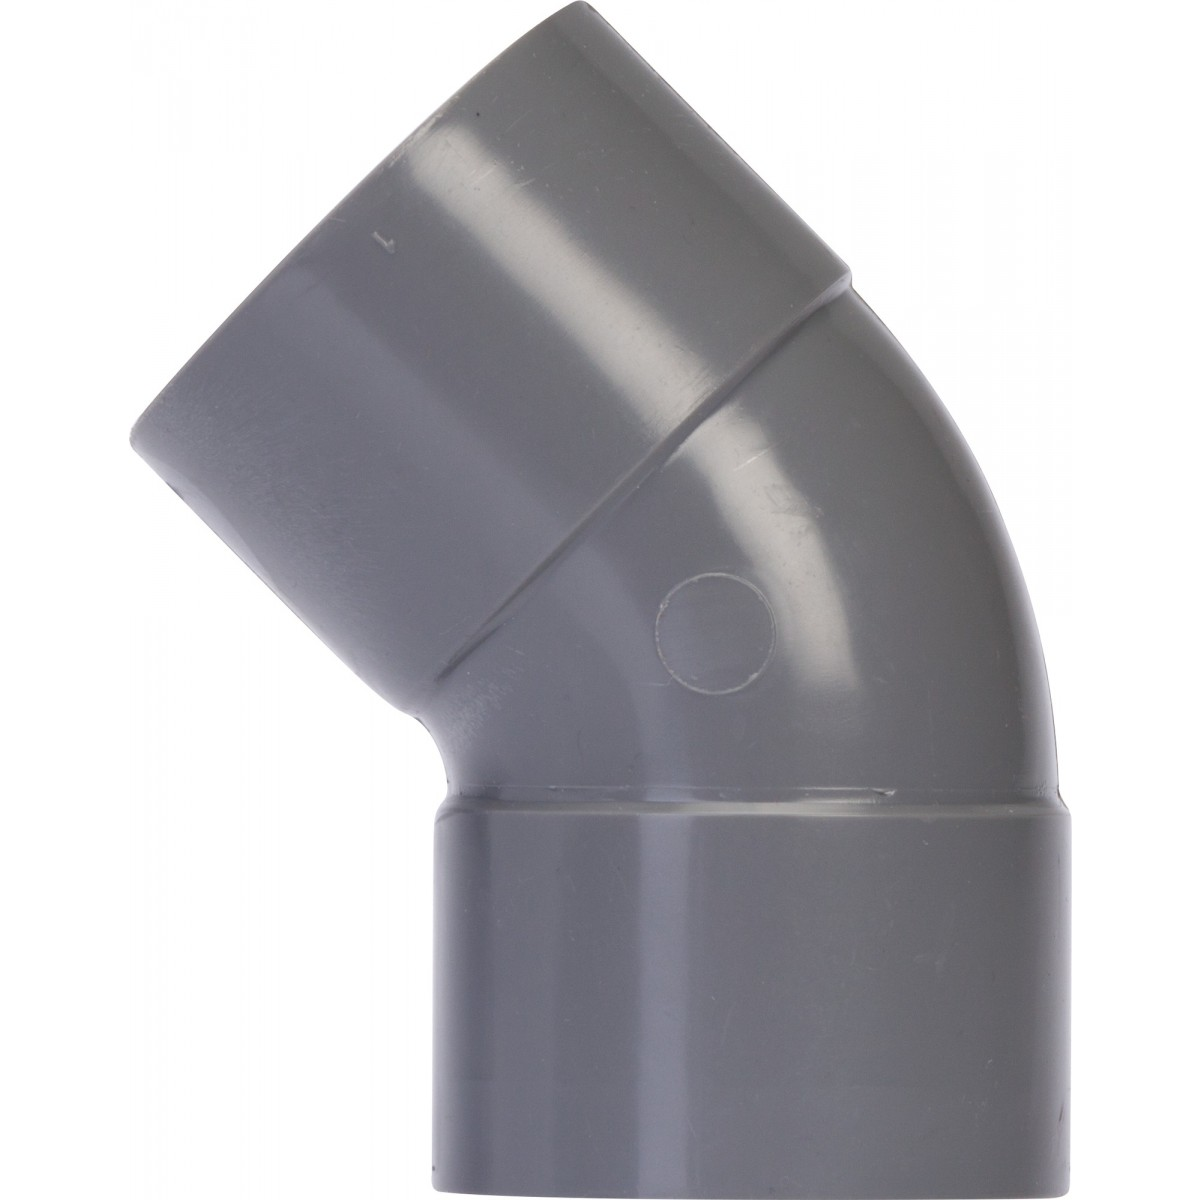 Coude à 45° Femelle / Femelle Girpi - Diamètre 32 mm